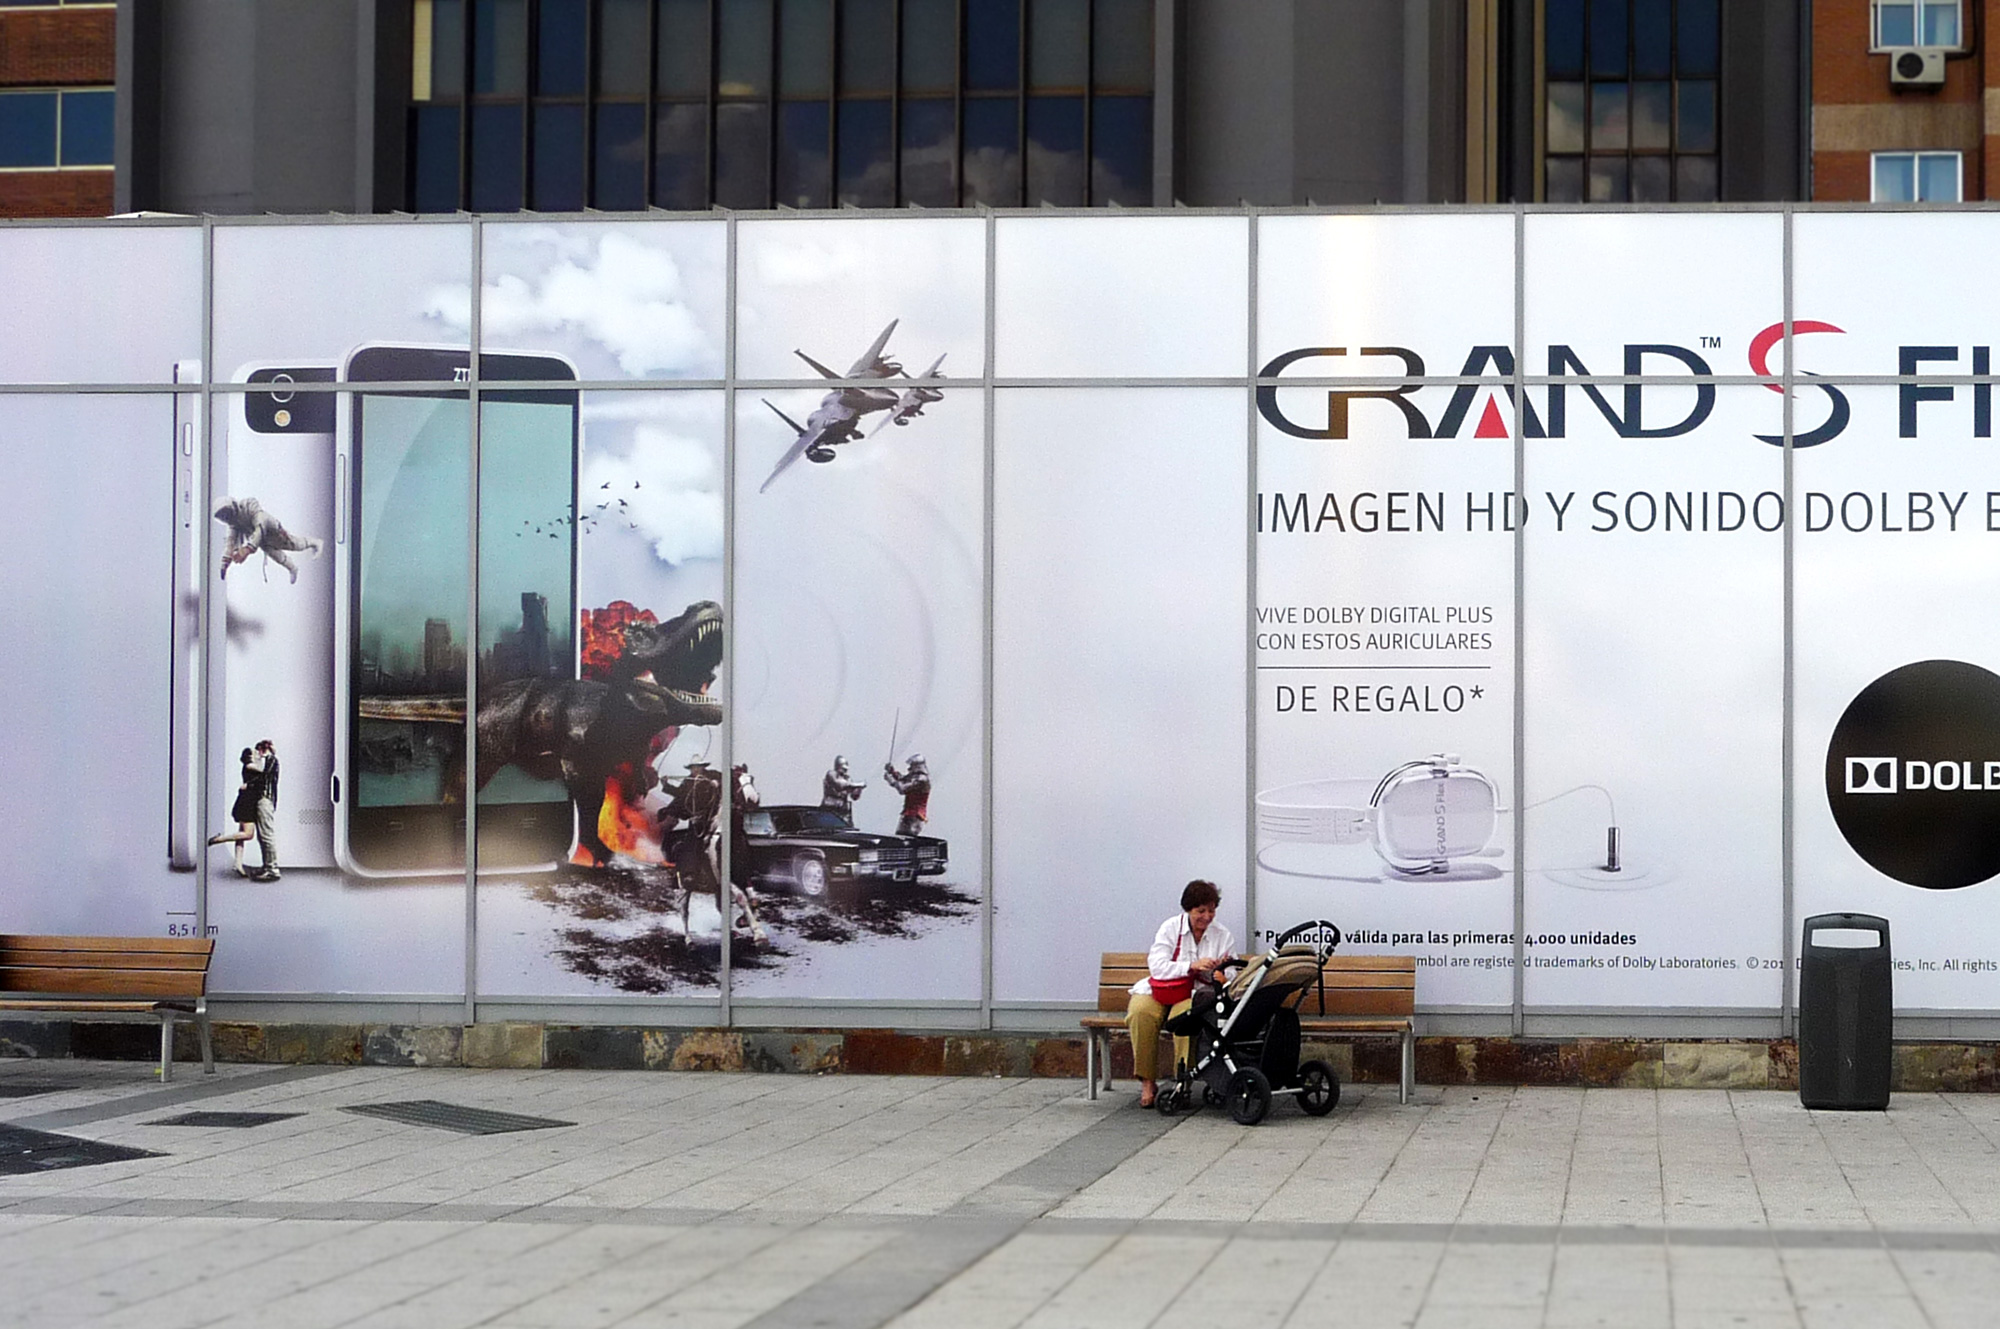 zte-grand-s-flex-02